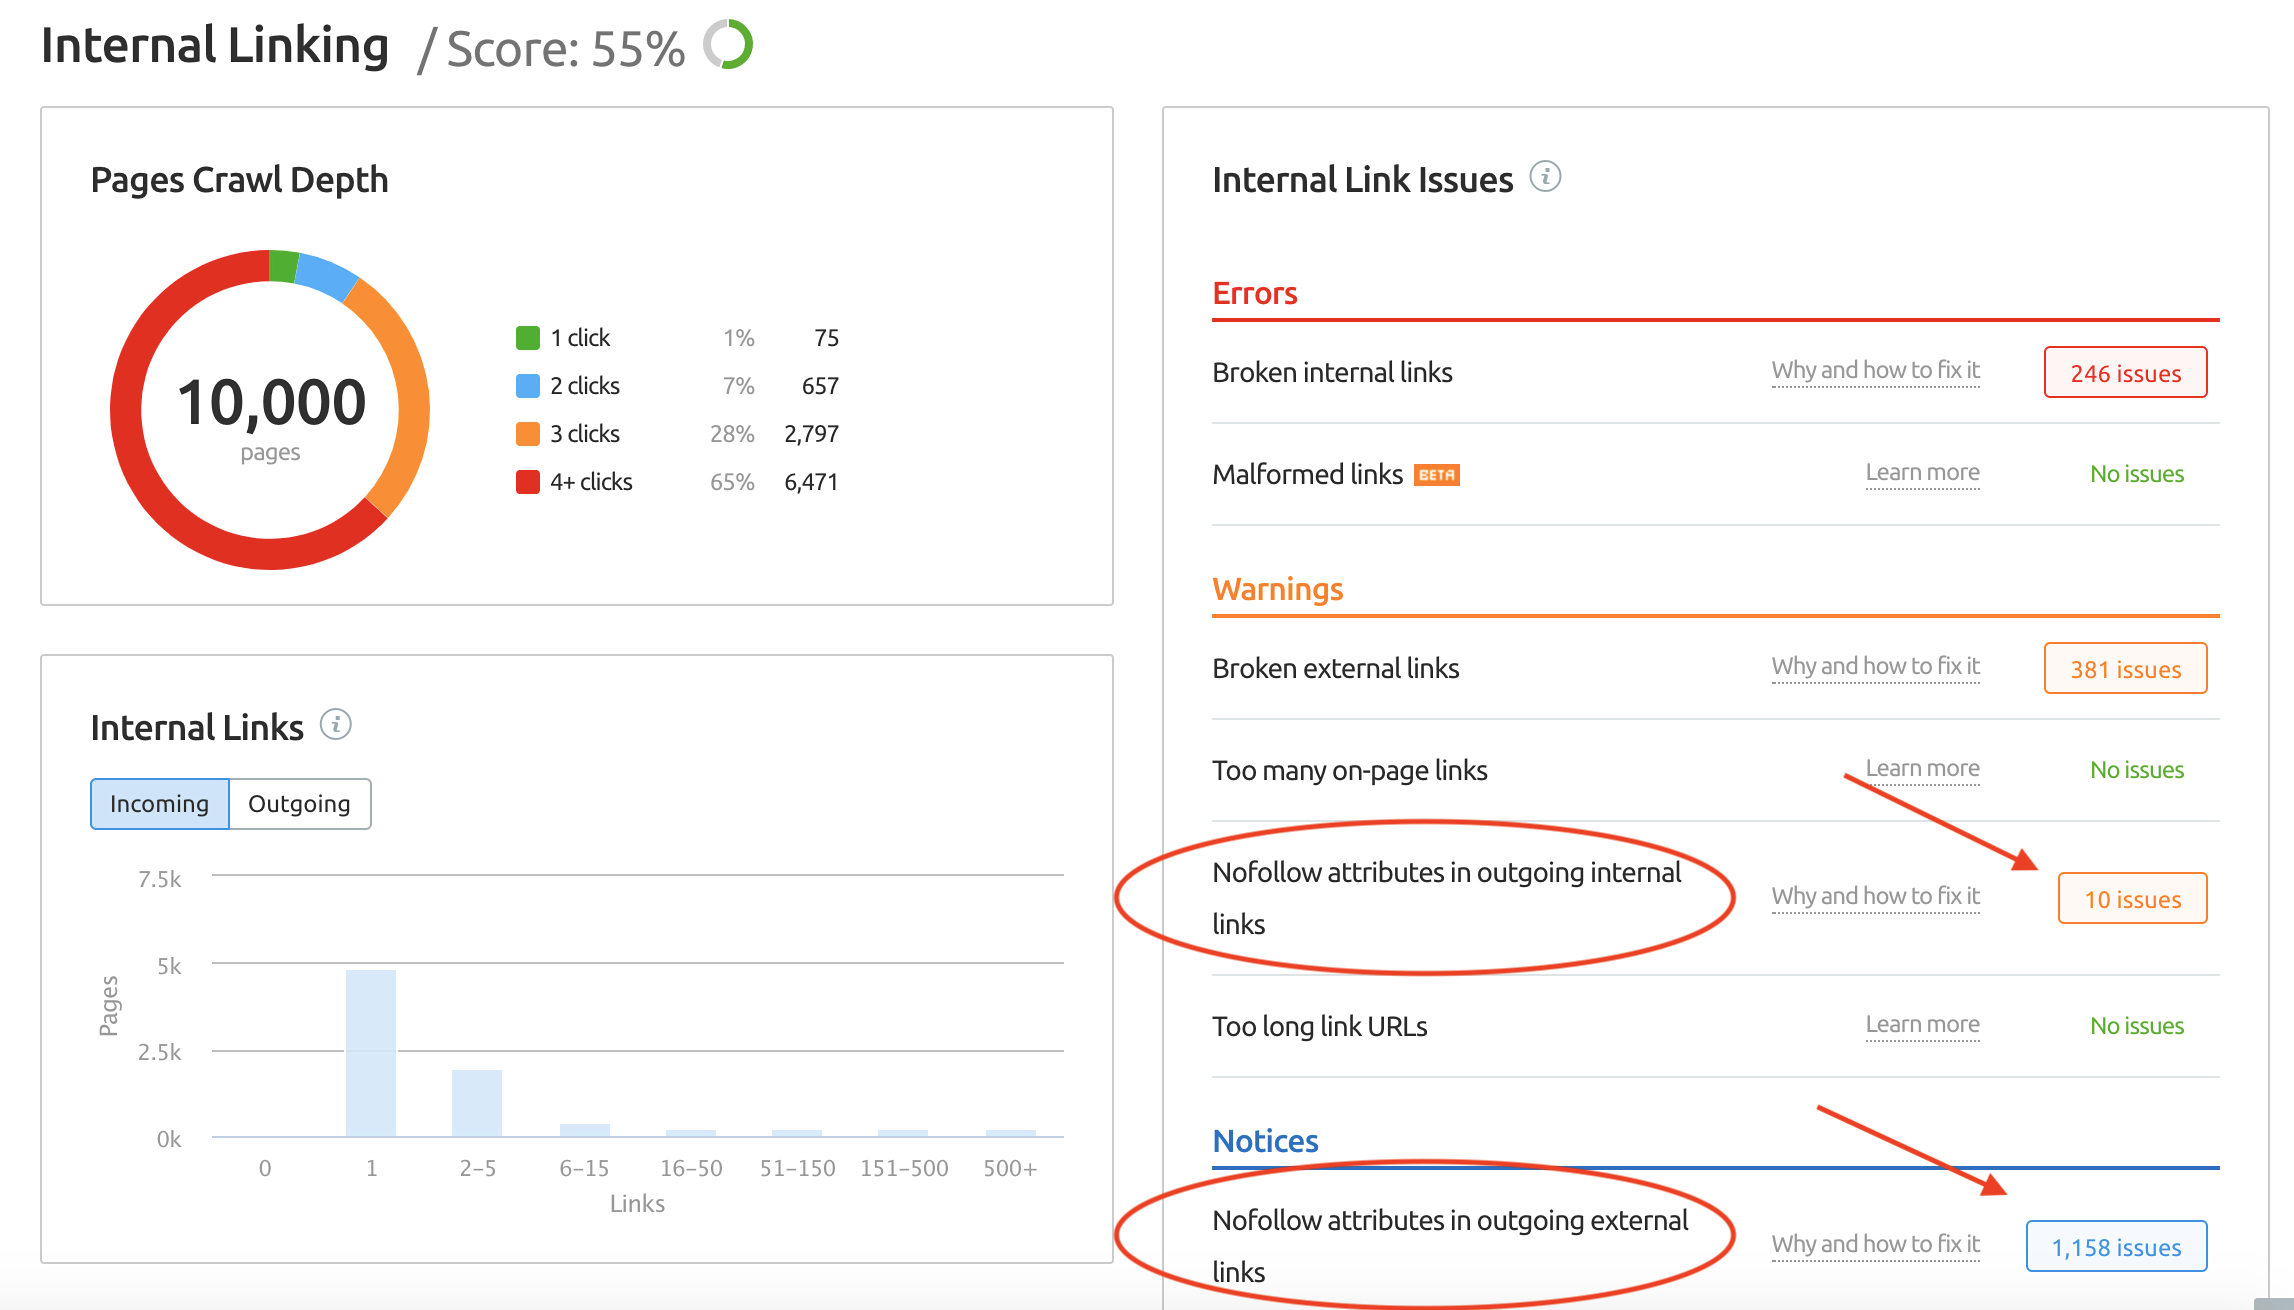 Internal linking issue results in SEMrush